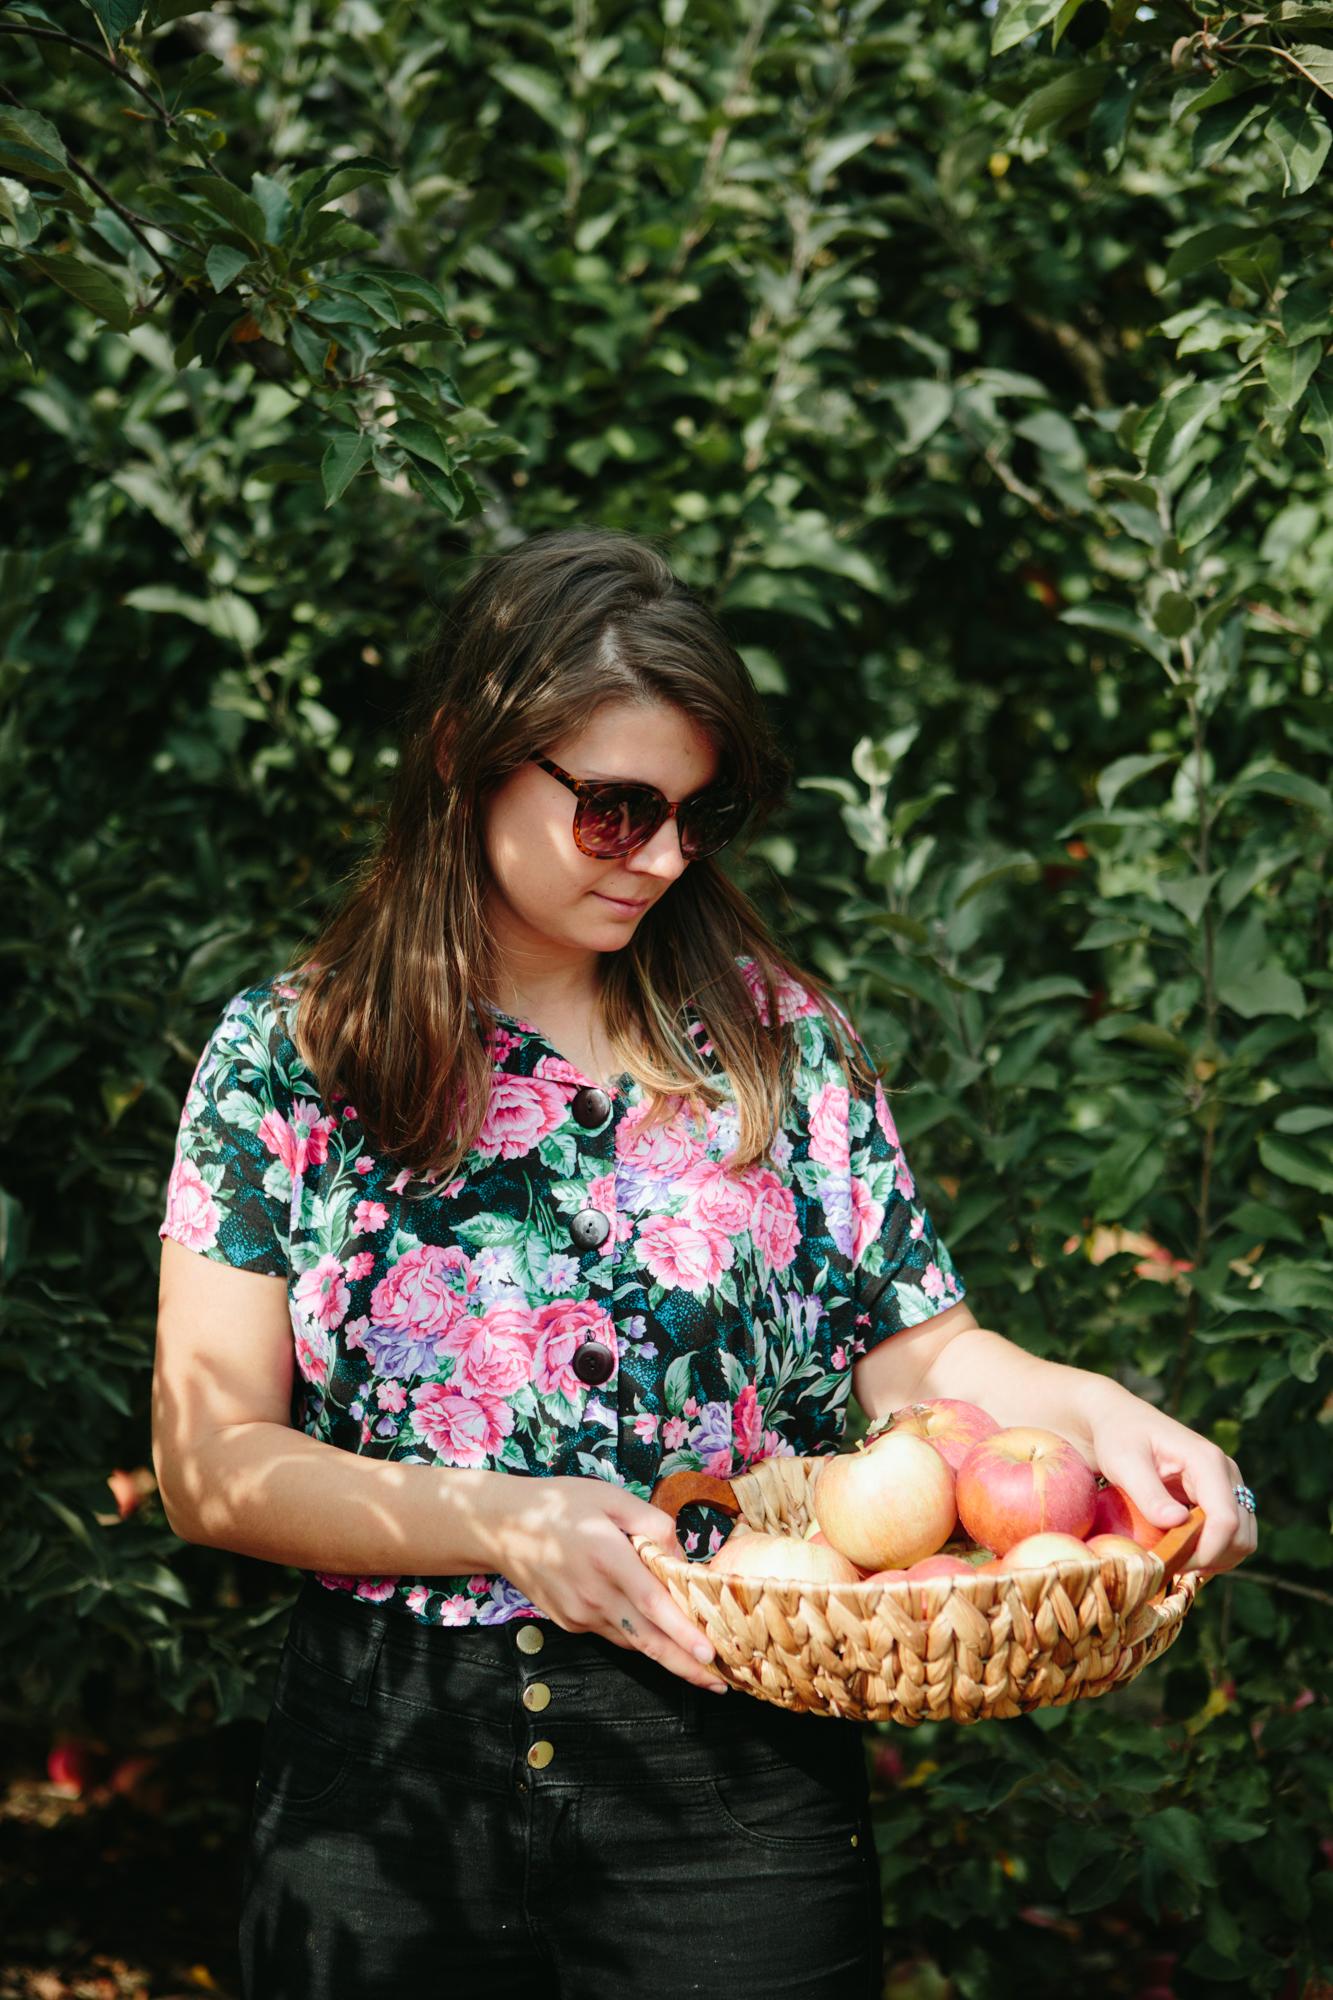 Photography of Shelly Westerhausen of Vegetarian 'Ventures in Bloomington, Indiana.